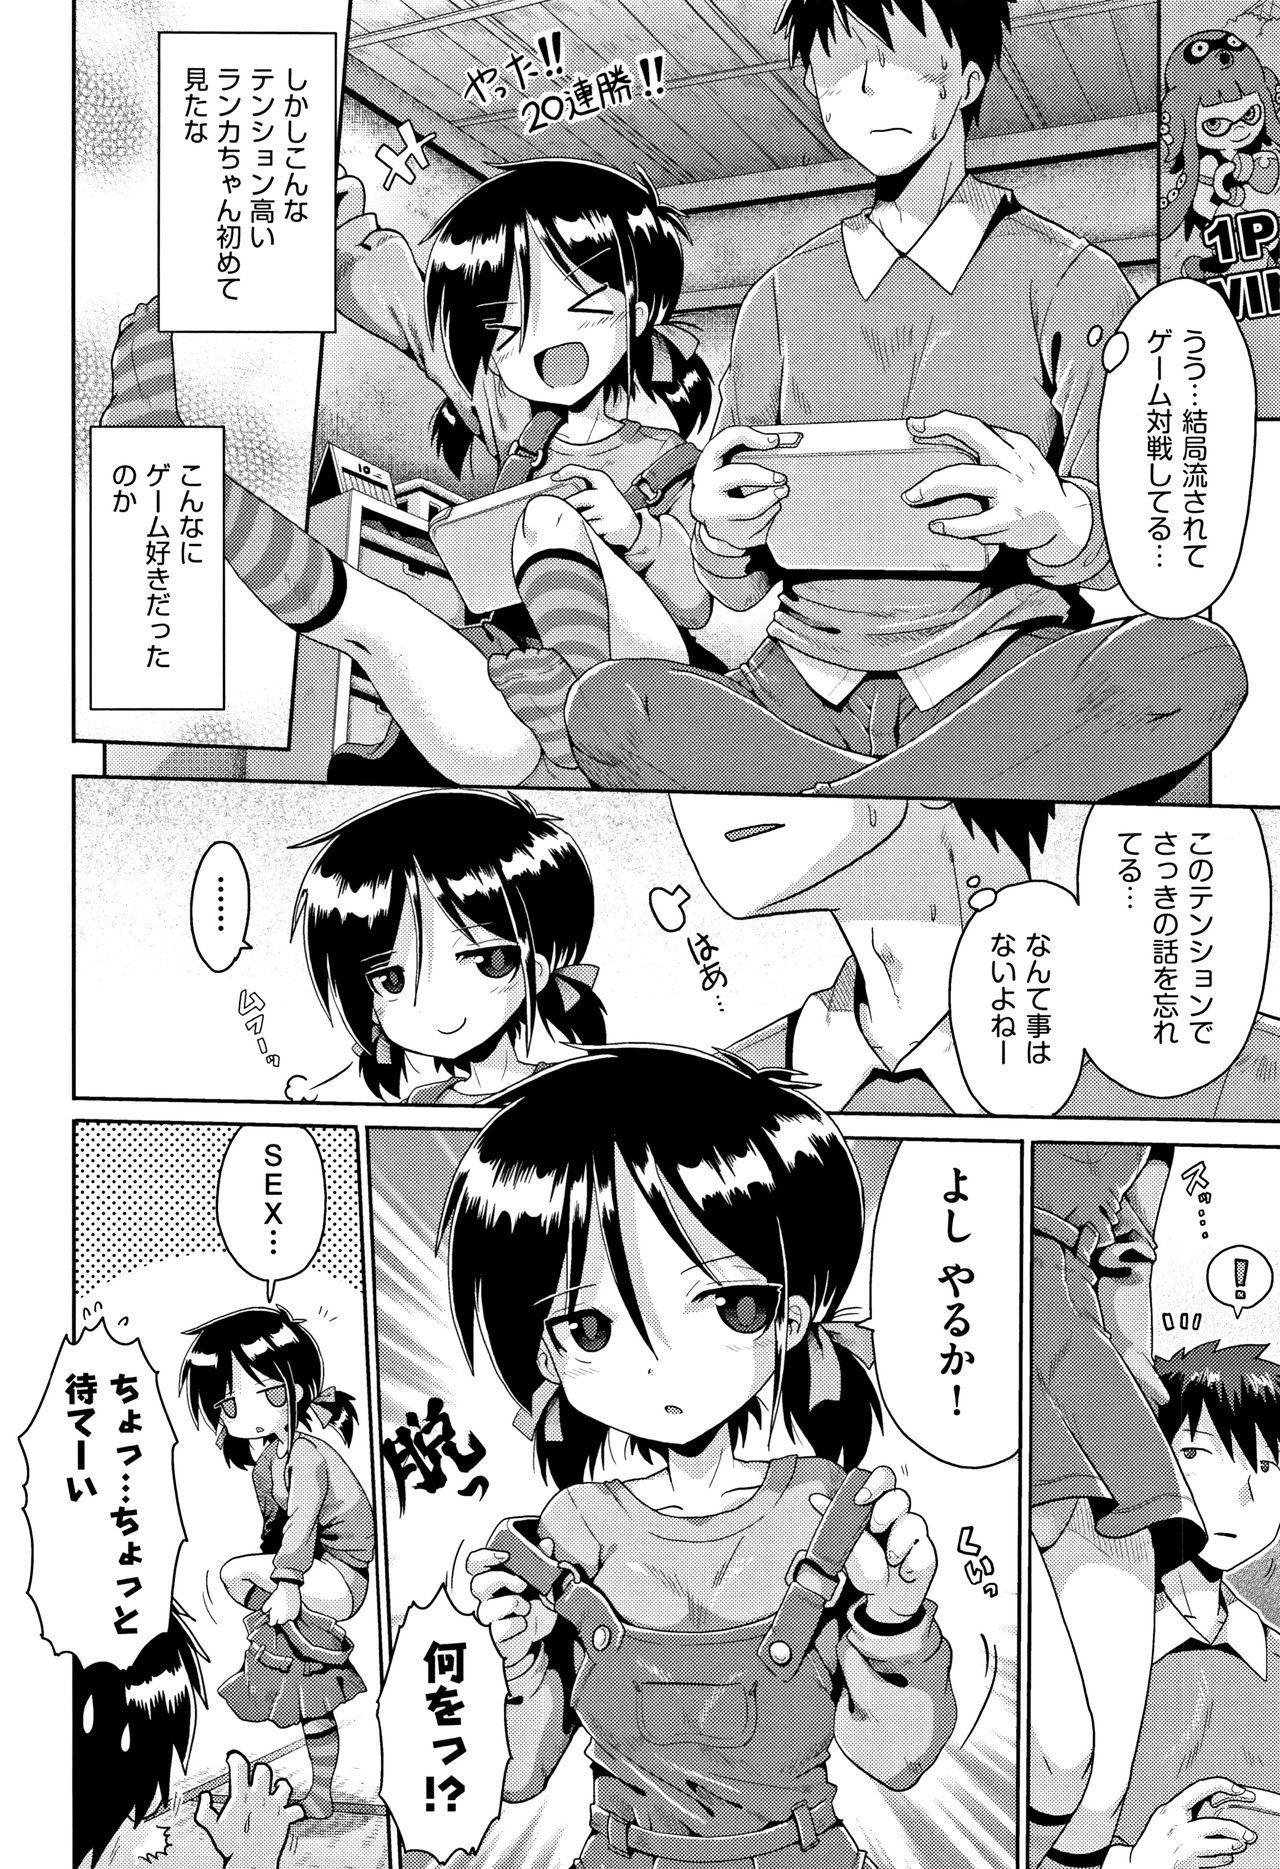 Kokugo Sansuu Rika Sex 36